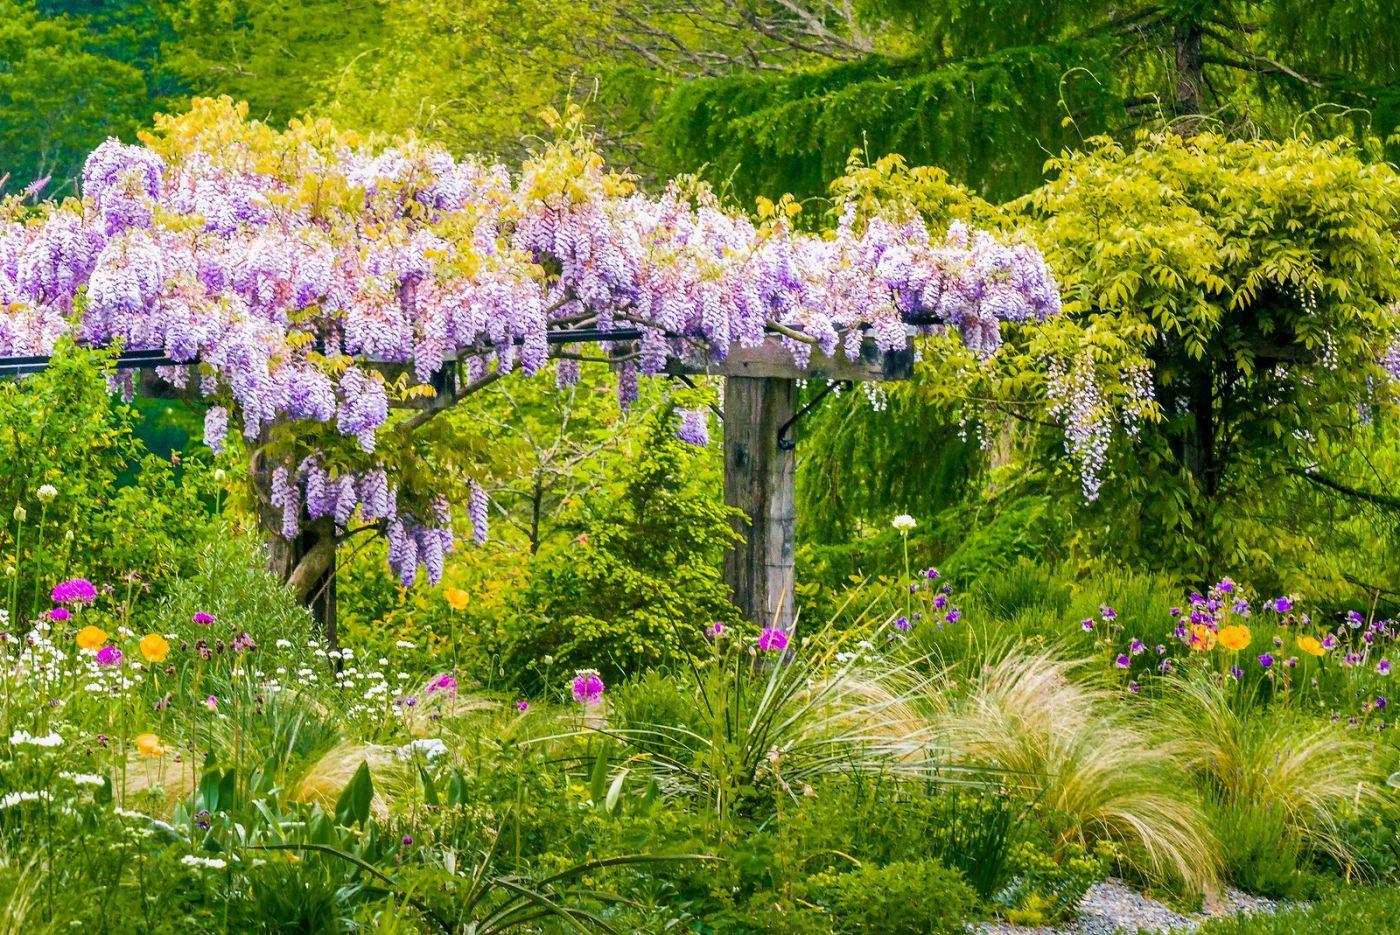 Chanticleer花园,那年盛开的紫藤花_图1-1